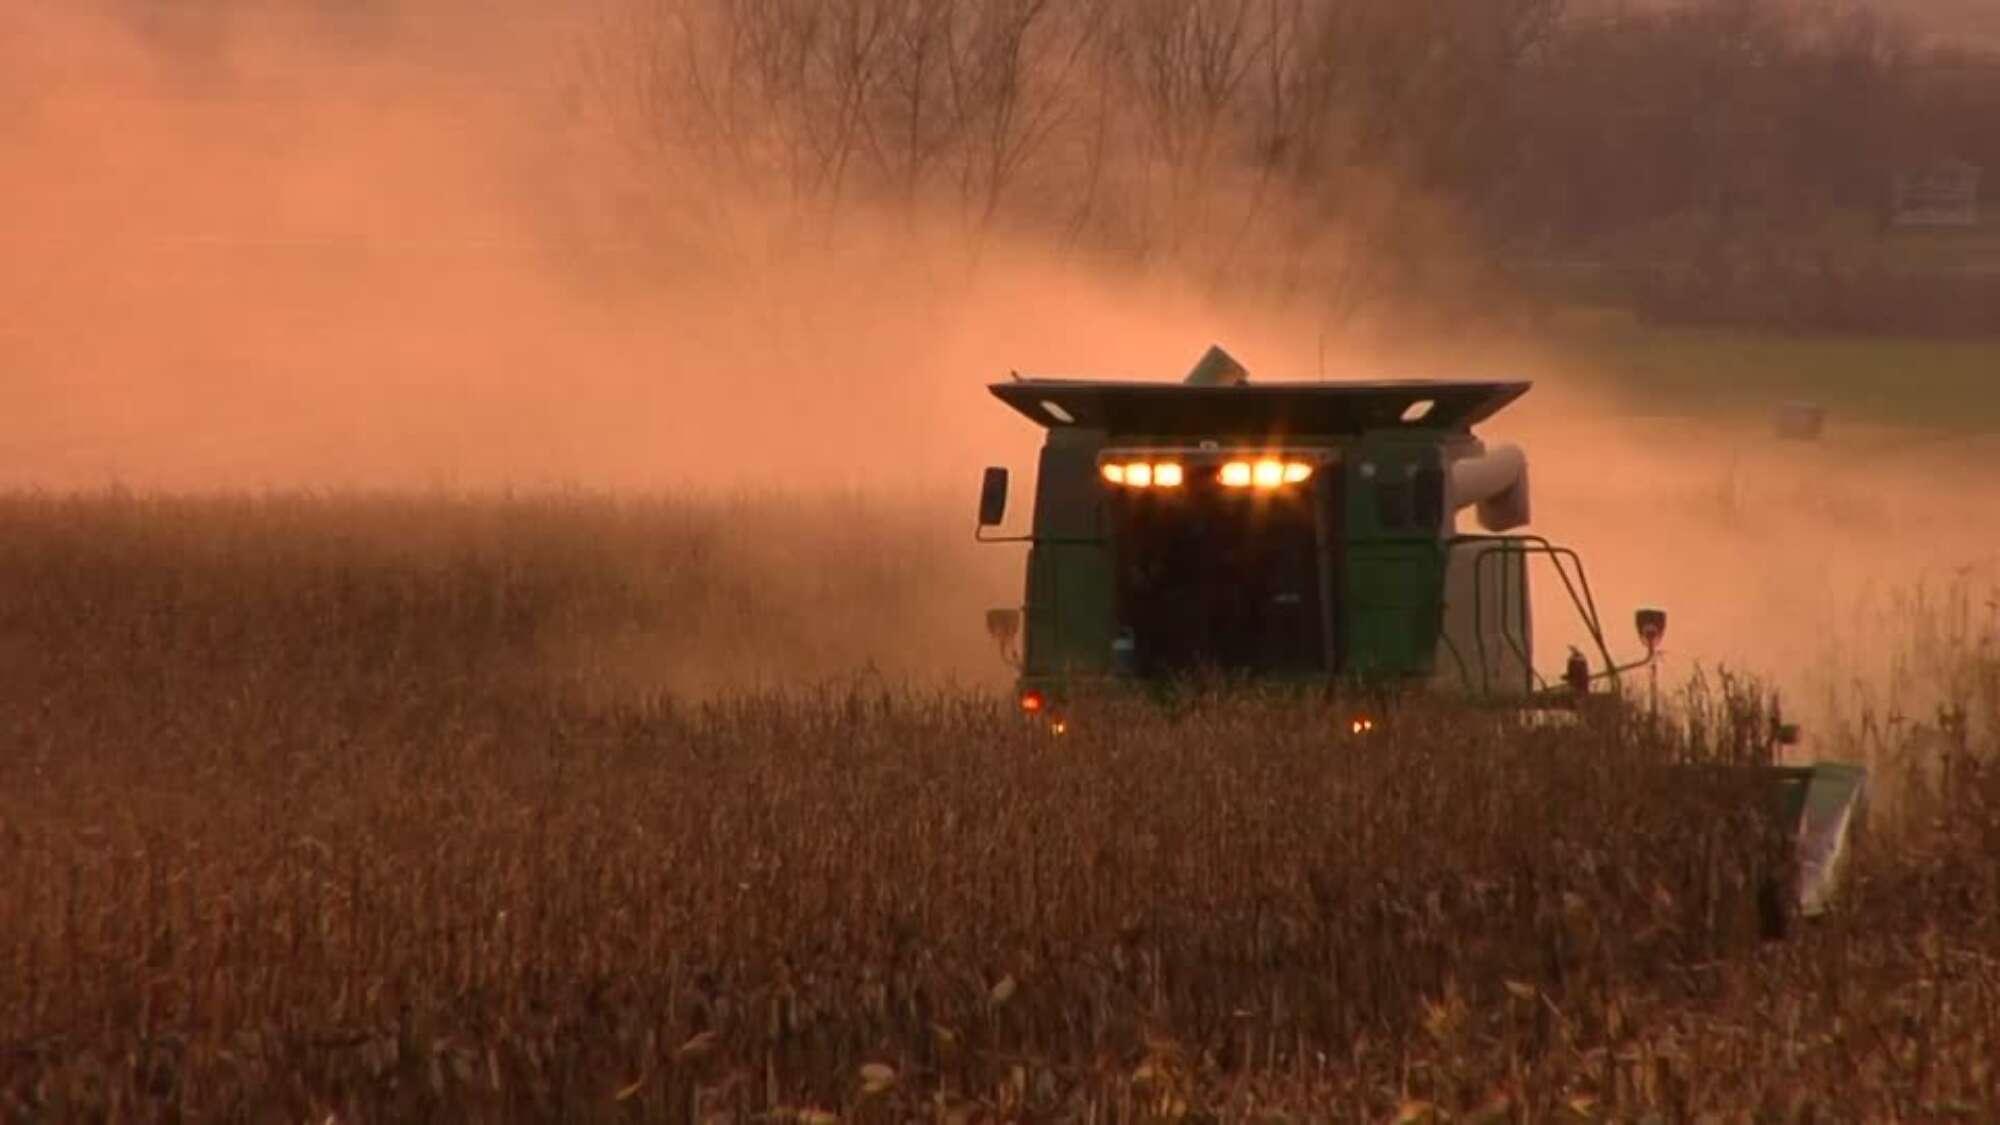 Agri Harvester Machine Harvesting Grain Combine Harvester Ripe Condition  002